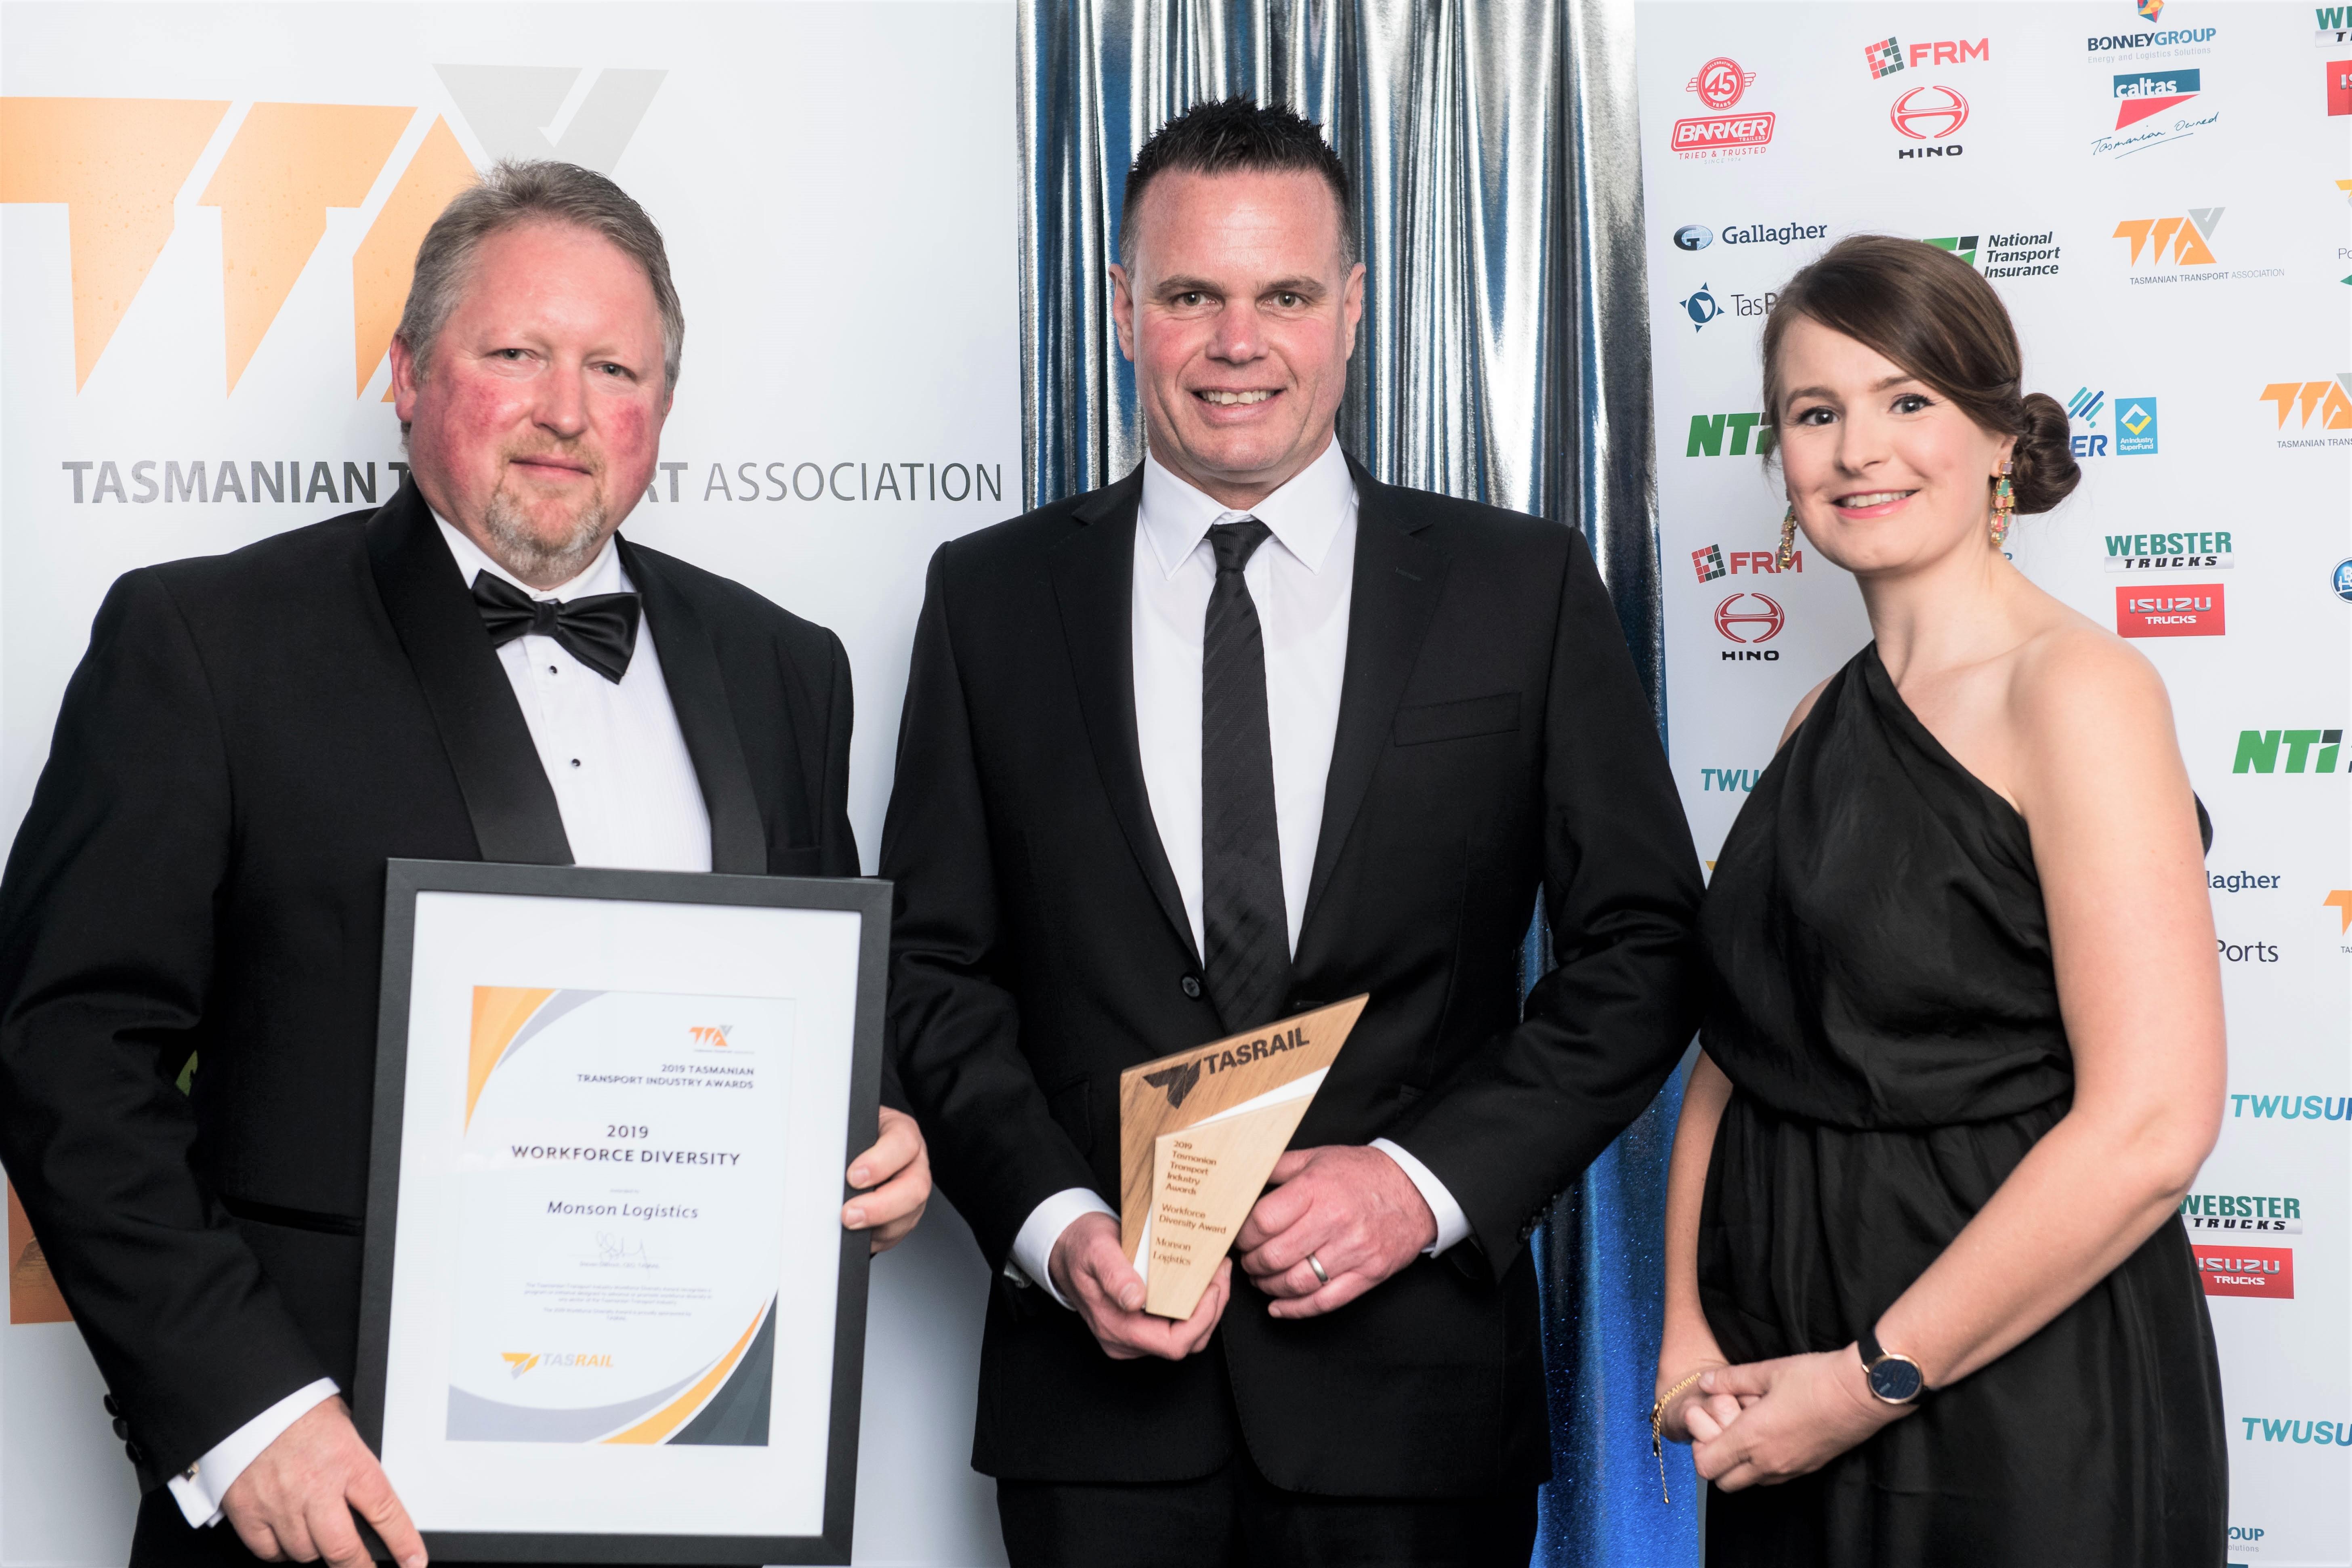 Steven Dietrich (TasRail), Darren Young (Monson Logistics) and Erin Mollinson (TasRail) present the 2019 TasRail Tasmanian Transport Industry Workforce Diversity Award to Monson Logistics